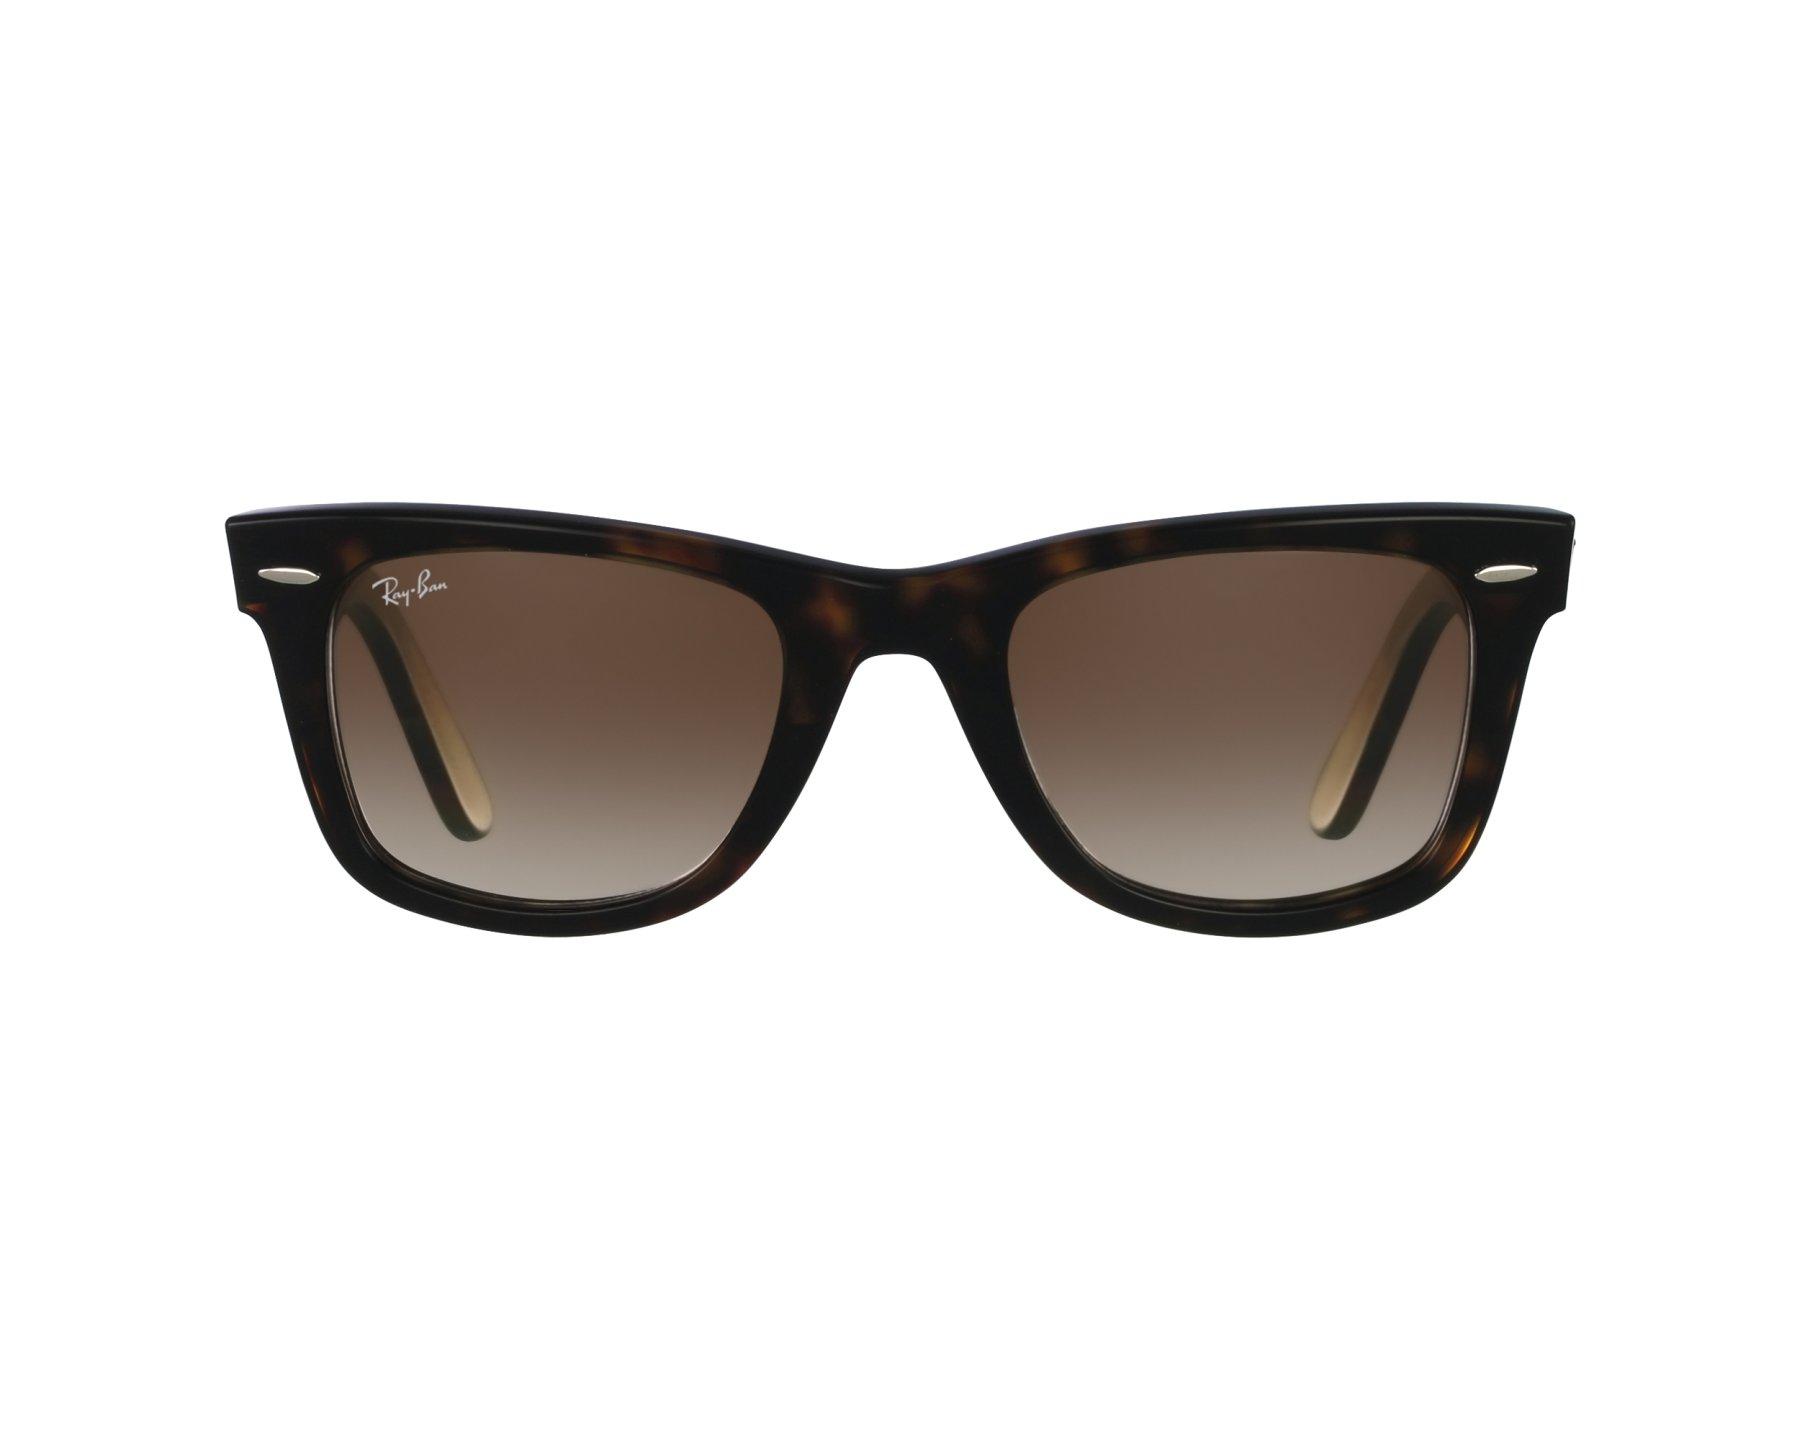 d97bba67196 Sunglasses Ray-Ban RB-2140 902 51 50-22 Havana profile view